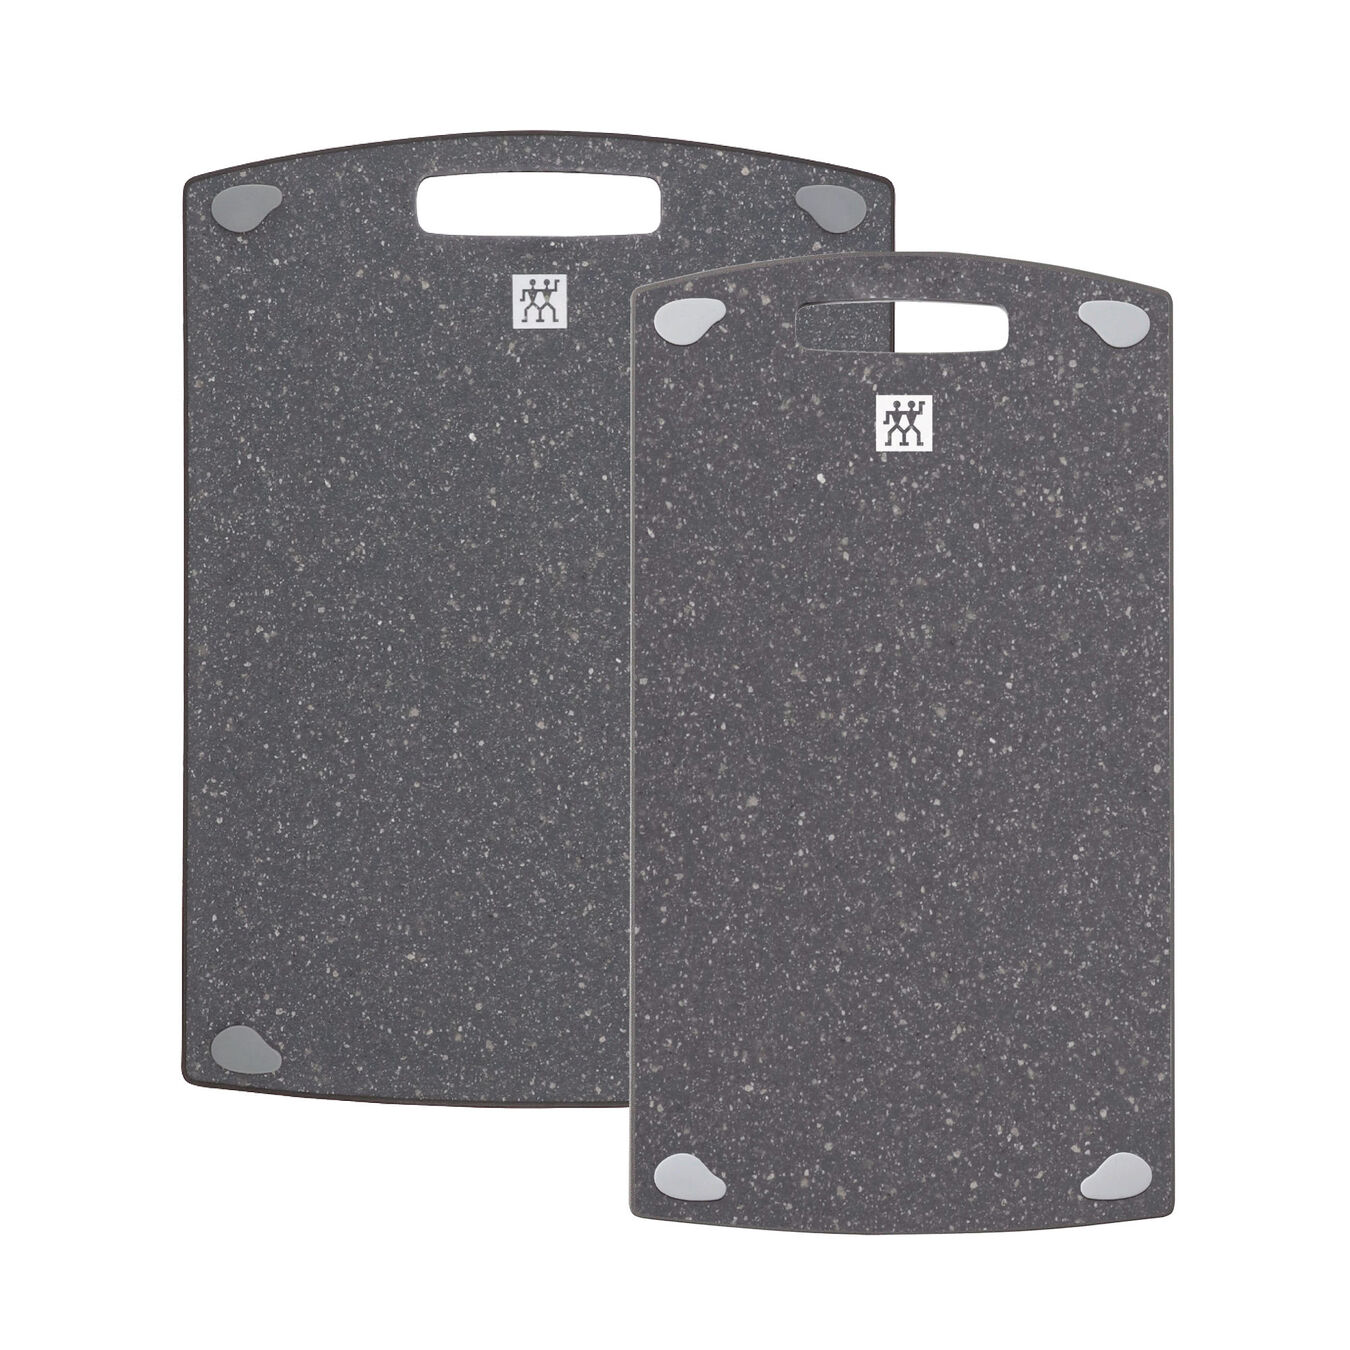 2 pc. Cutting board set, Plastic | 36 cm x 20 cm & 37 cm x 27 cm 36 cm x 20 cm Plastic,,large 1